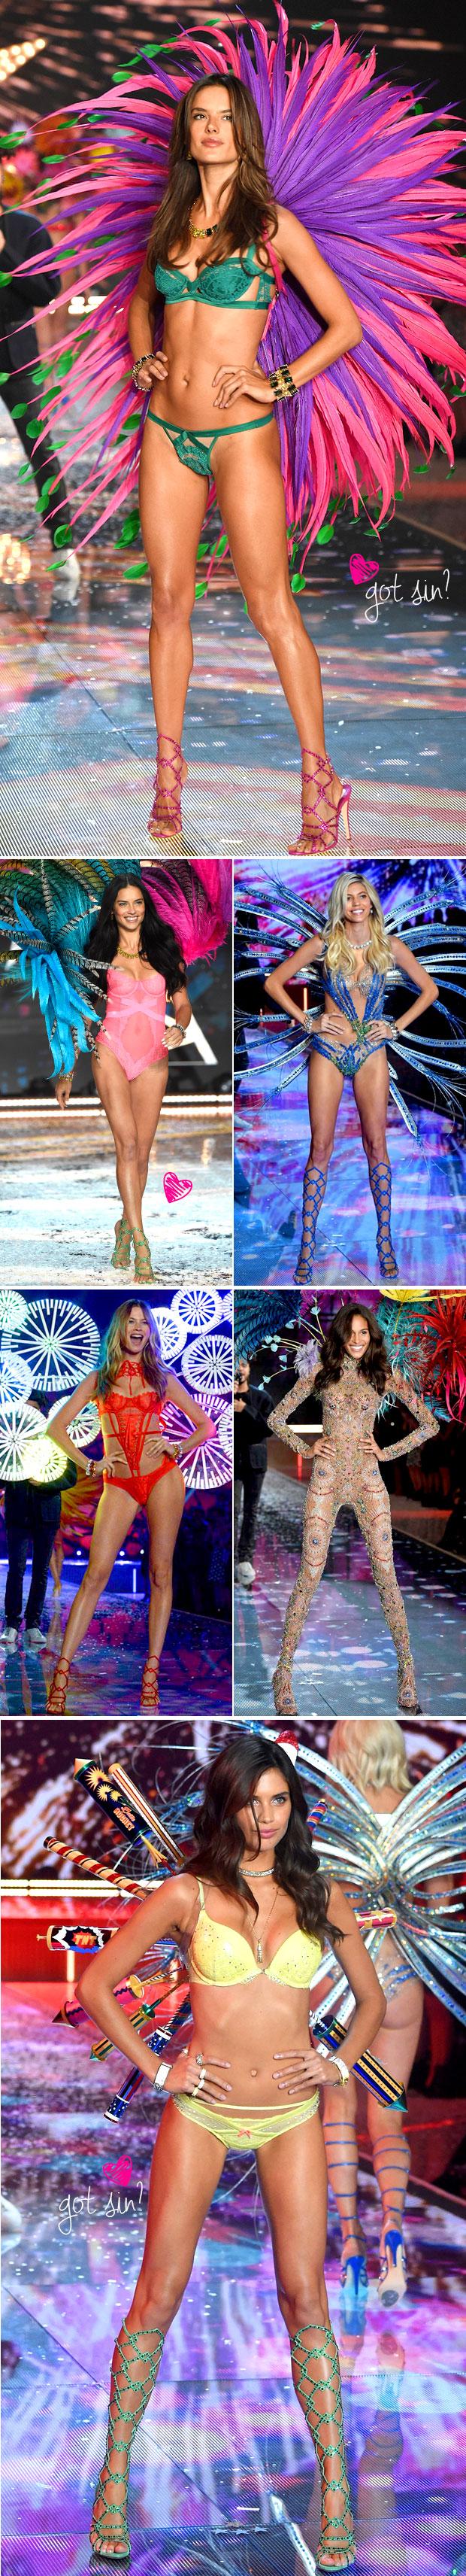 victorias-secret-fashion-show-todas-as-fotos-blog-got-sin-fireworks-alessandra-ambrosio-behati-prinsloo-sarah-sampaio